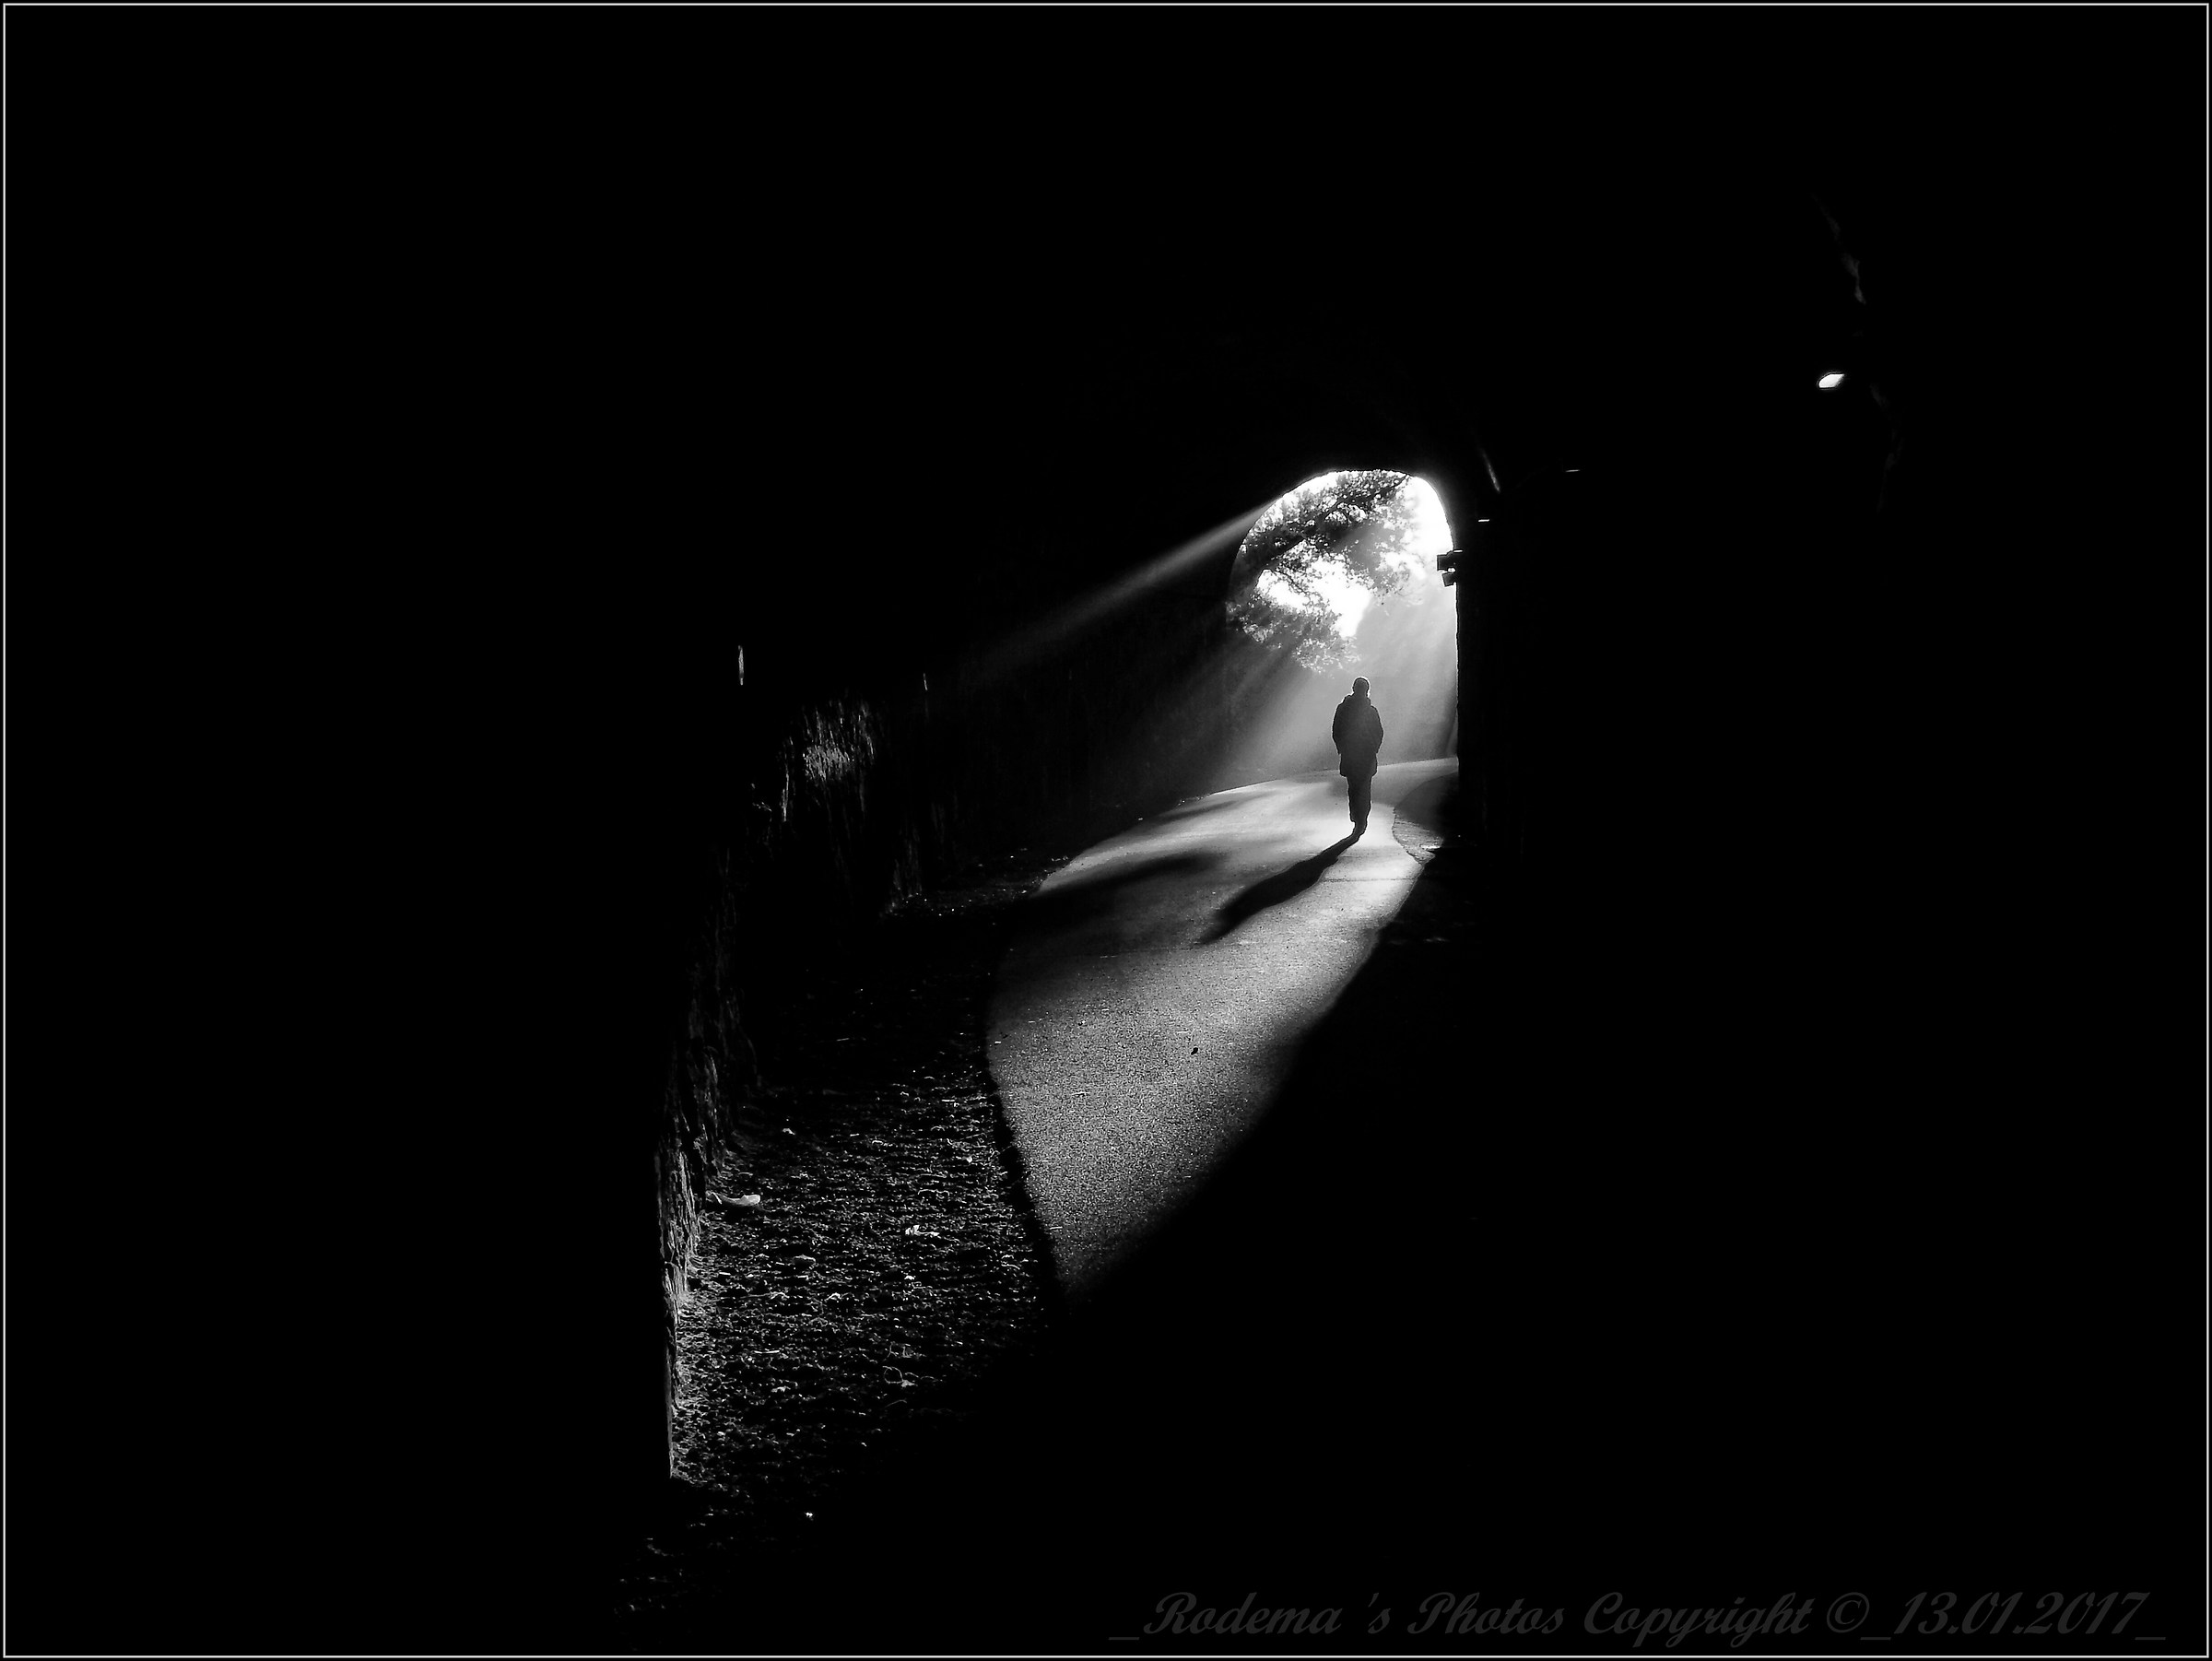 Toward the light...